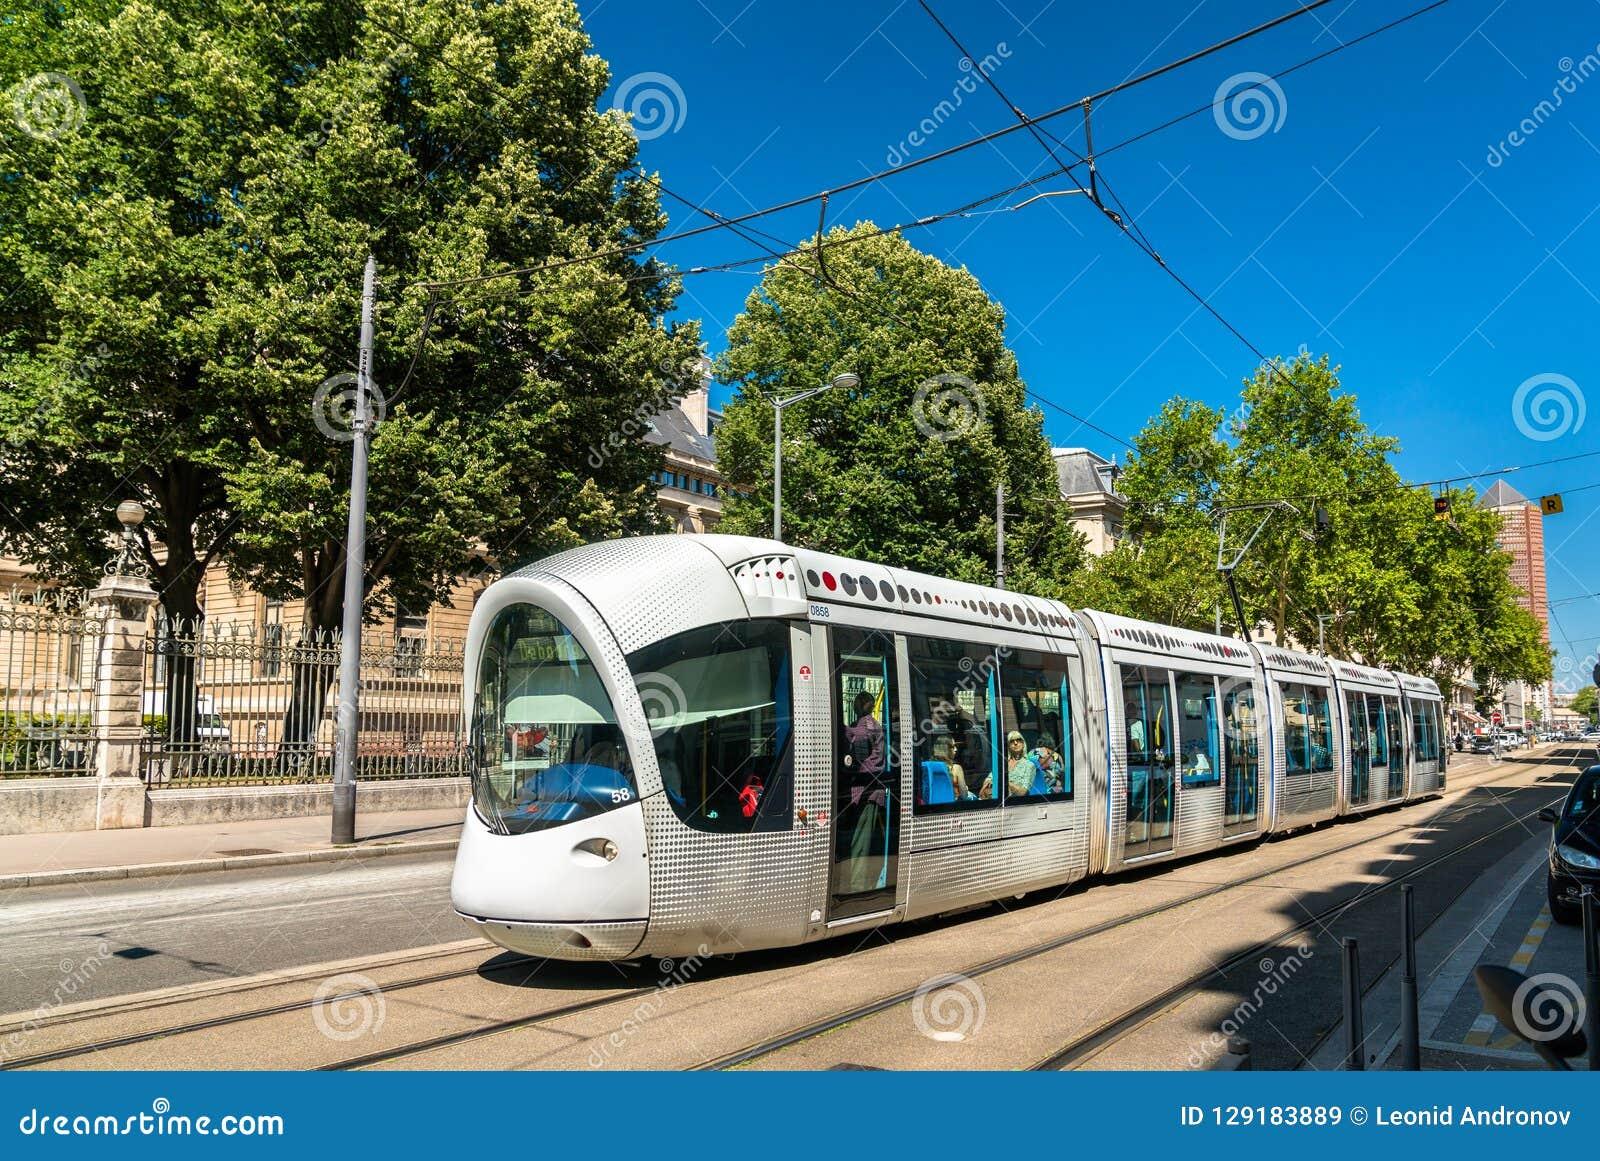 Tram Alstom-CITADIS 302 in Lyon, Frankreich